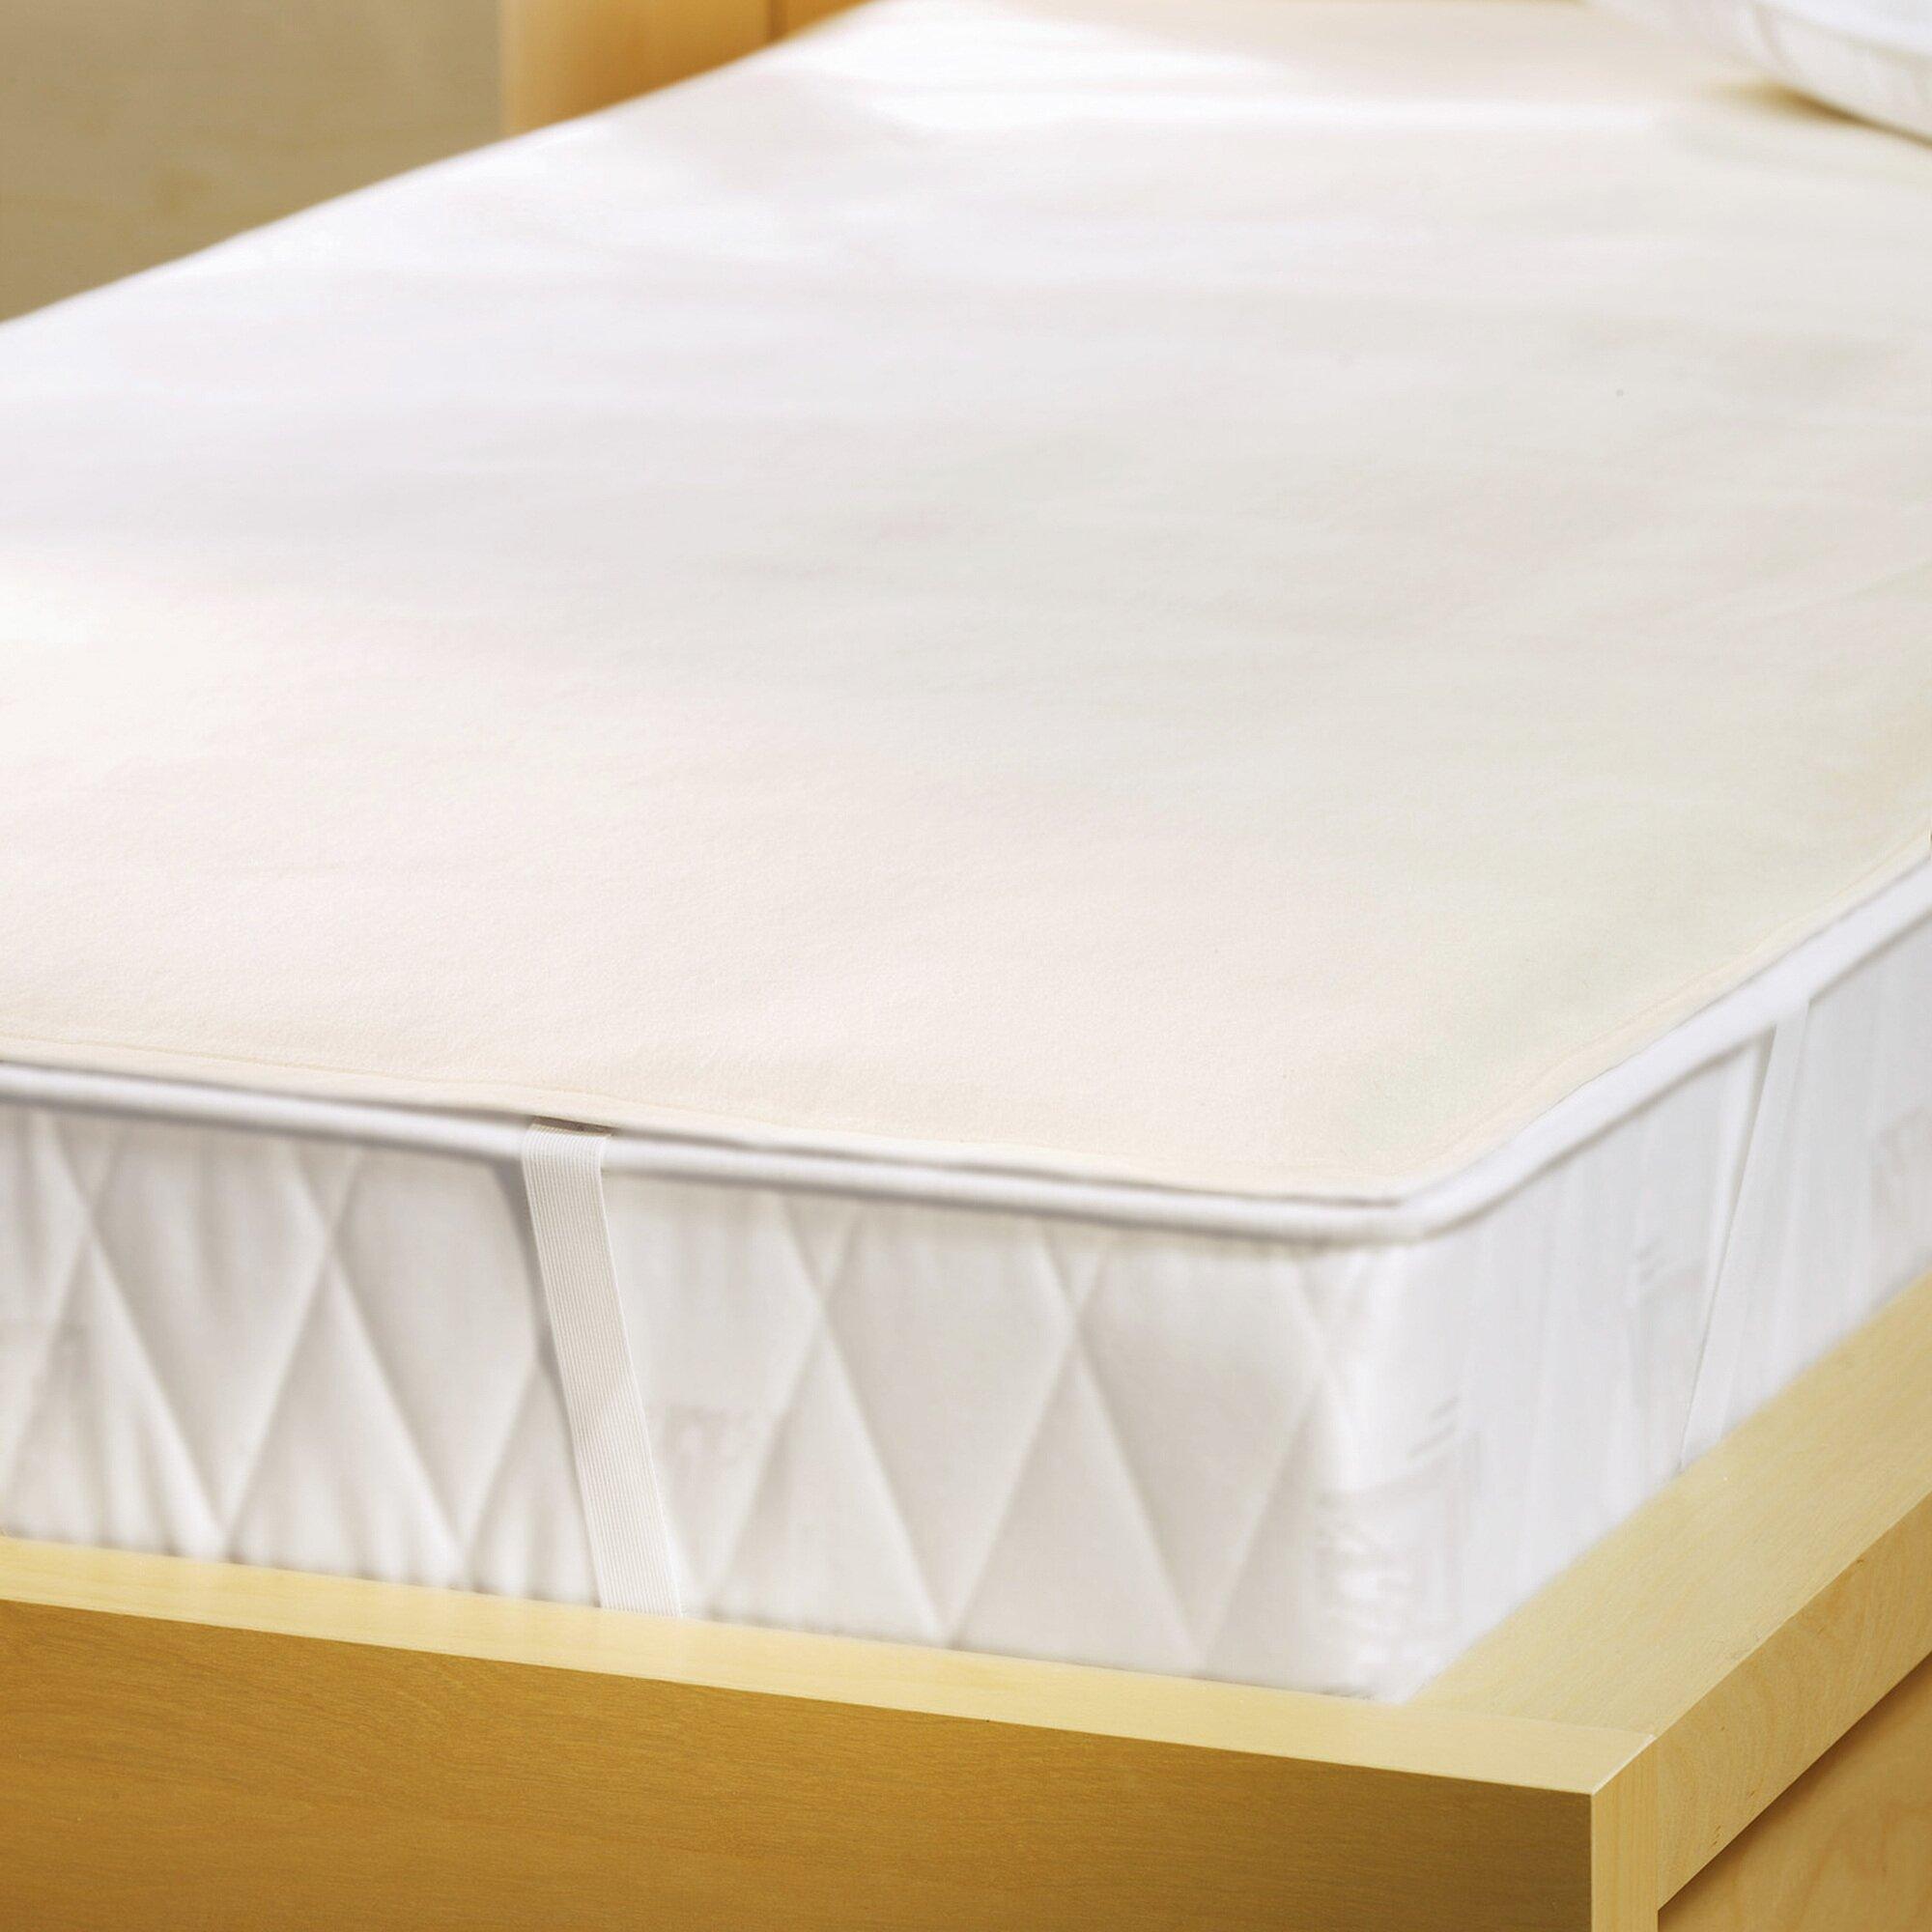 Setex Molton-Matratzenauflage 60x120 cm